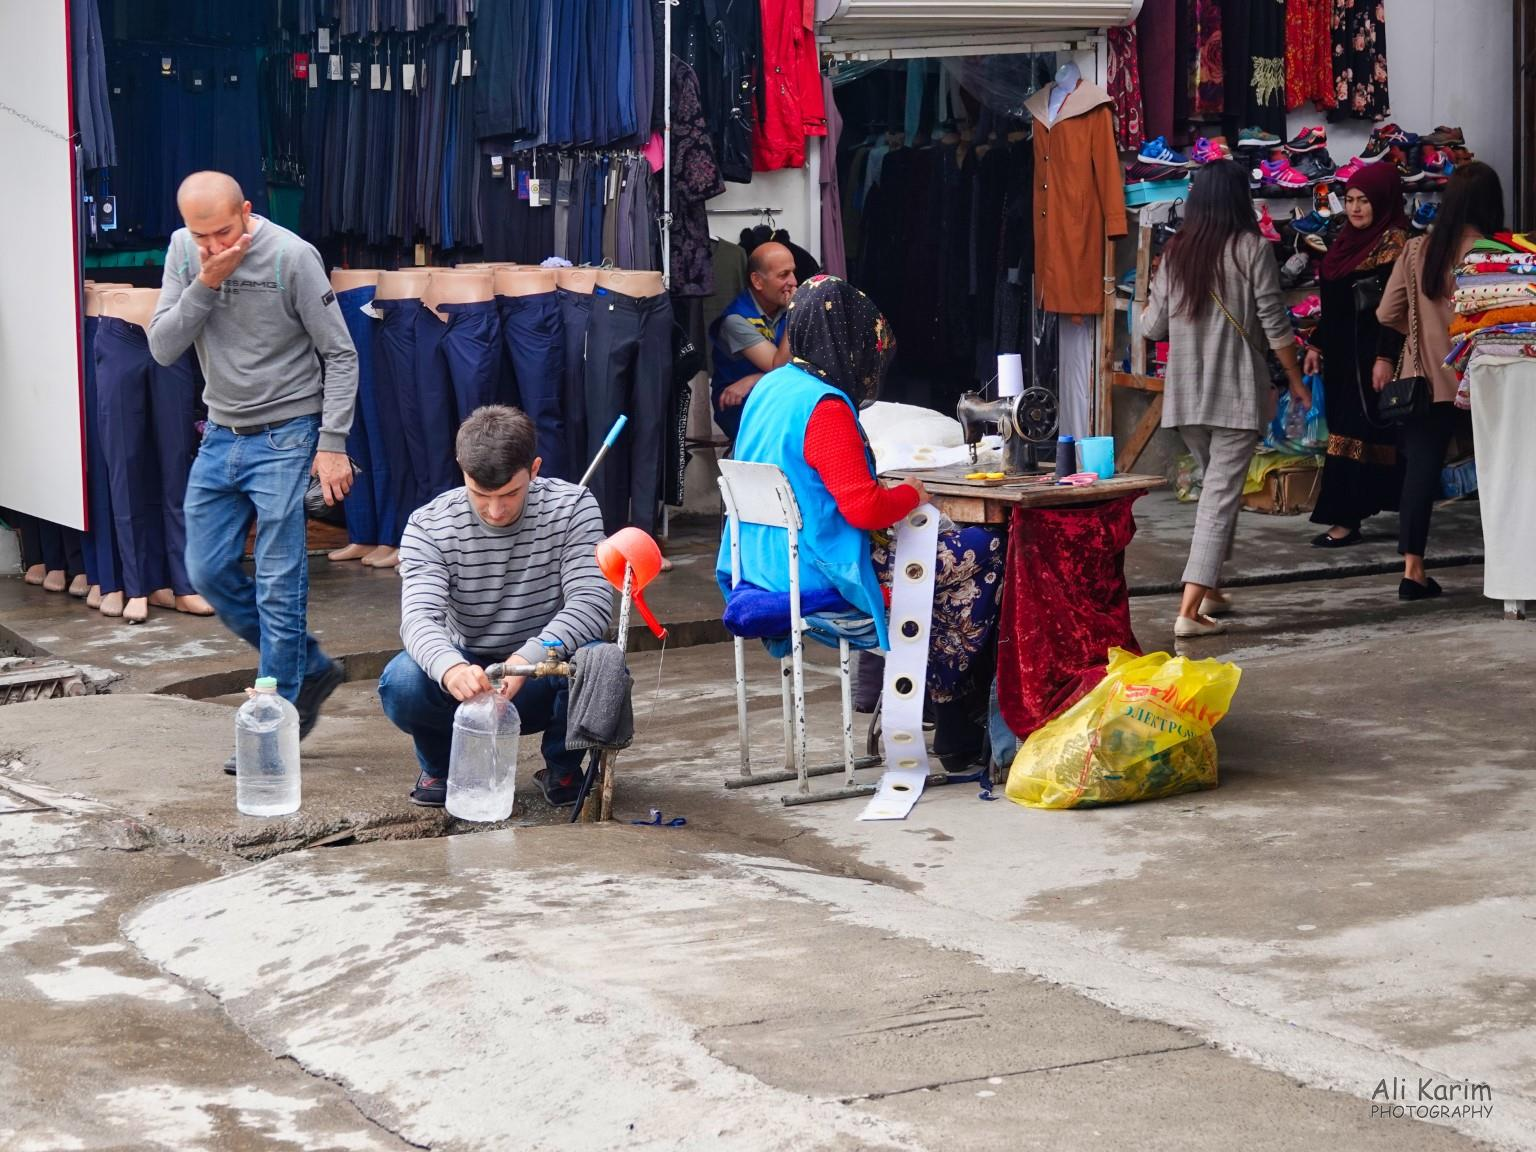 More Dushanbe, Tajikistan Watering hole in the market